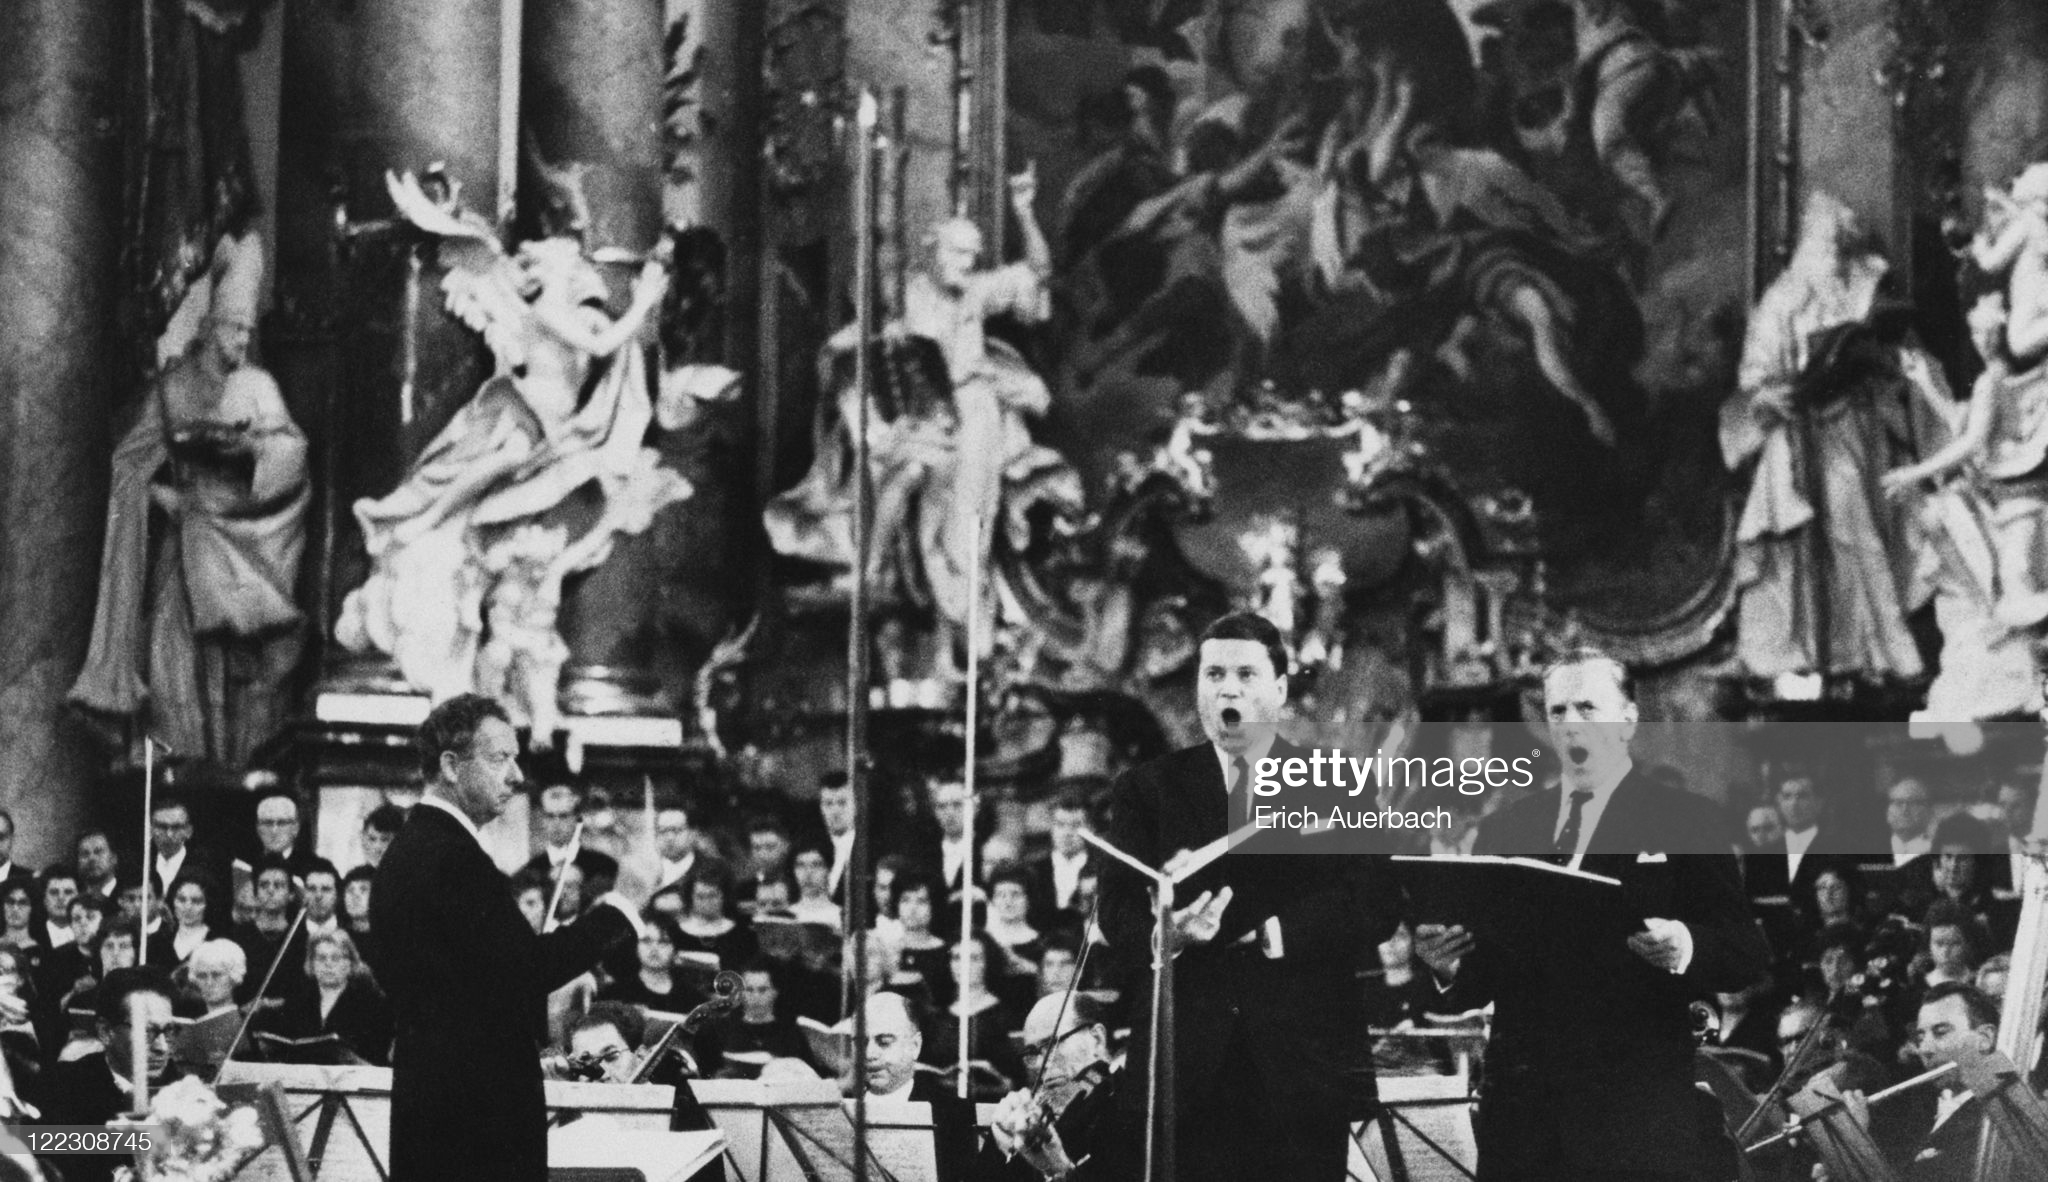 Военный реквием в Баварии. Бенджамин Бриттен, Дитрих Фишер-Дискау и Питер Пирс. 1964 год © Photo by Erich Auerbach/Hulton Archive/Getty Images